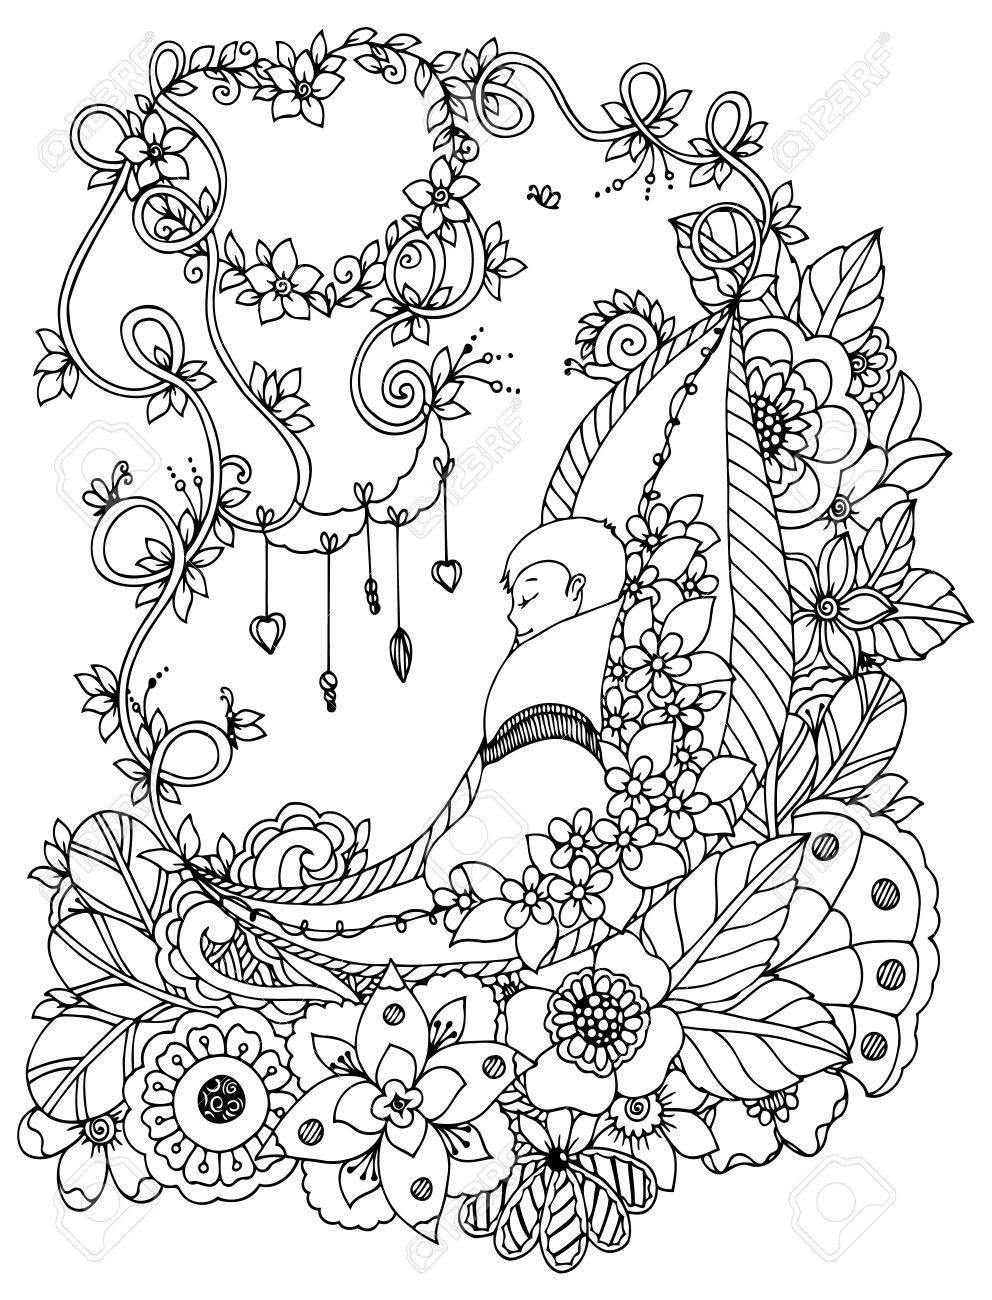 Coloriage Bebe Fleurs.Vector Illustration Zentangl Le Bebe Dort Dans Les Fleurs Dessin